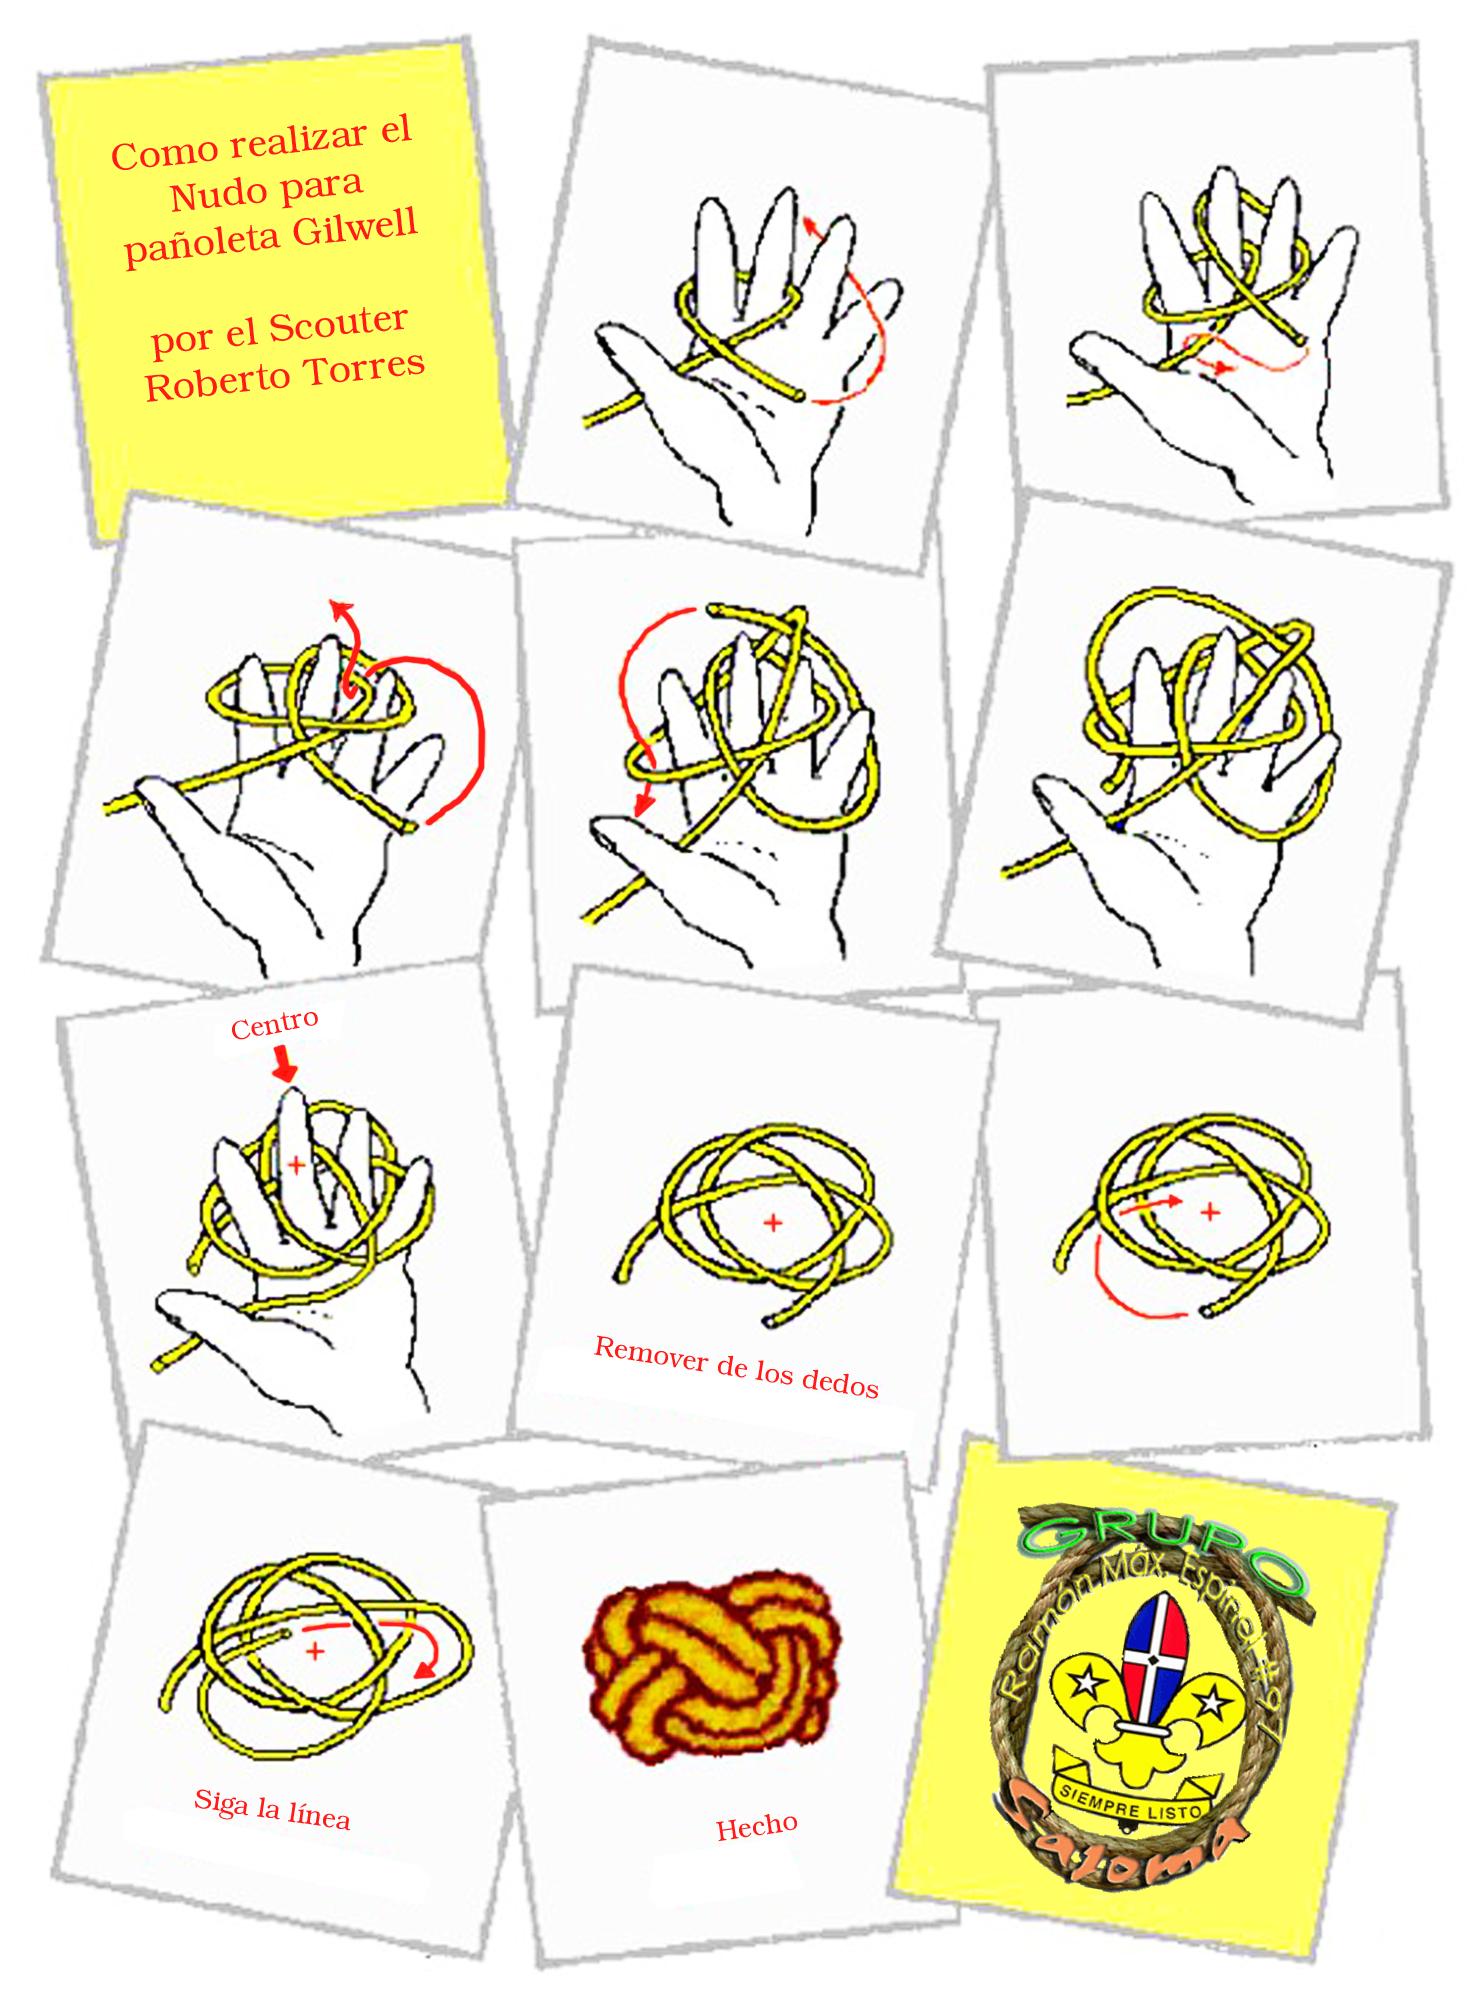 paracord monkey fist instructions pdf